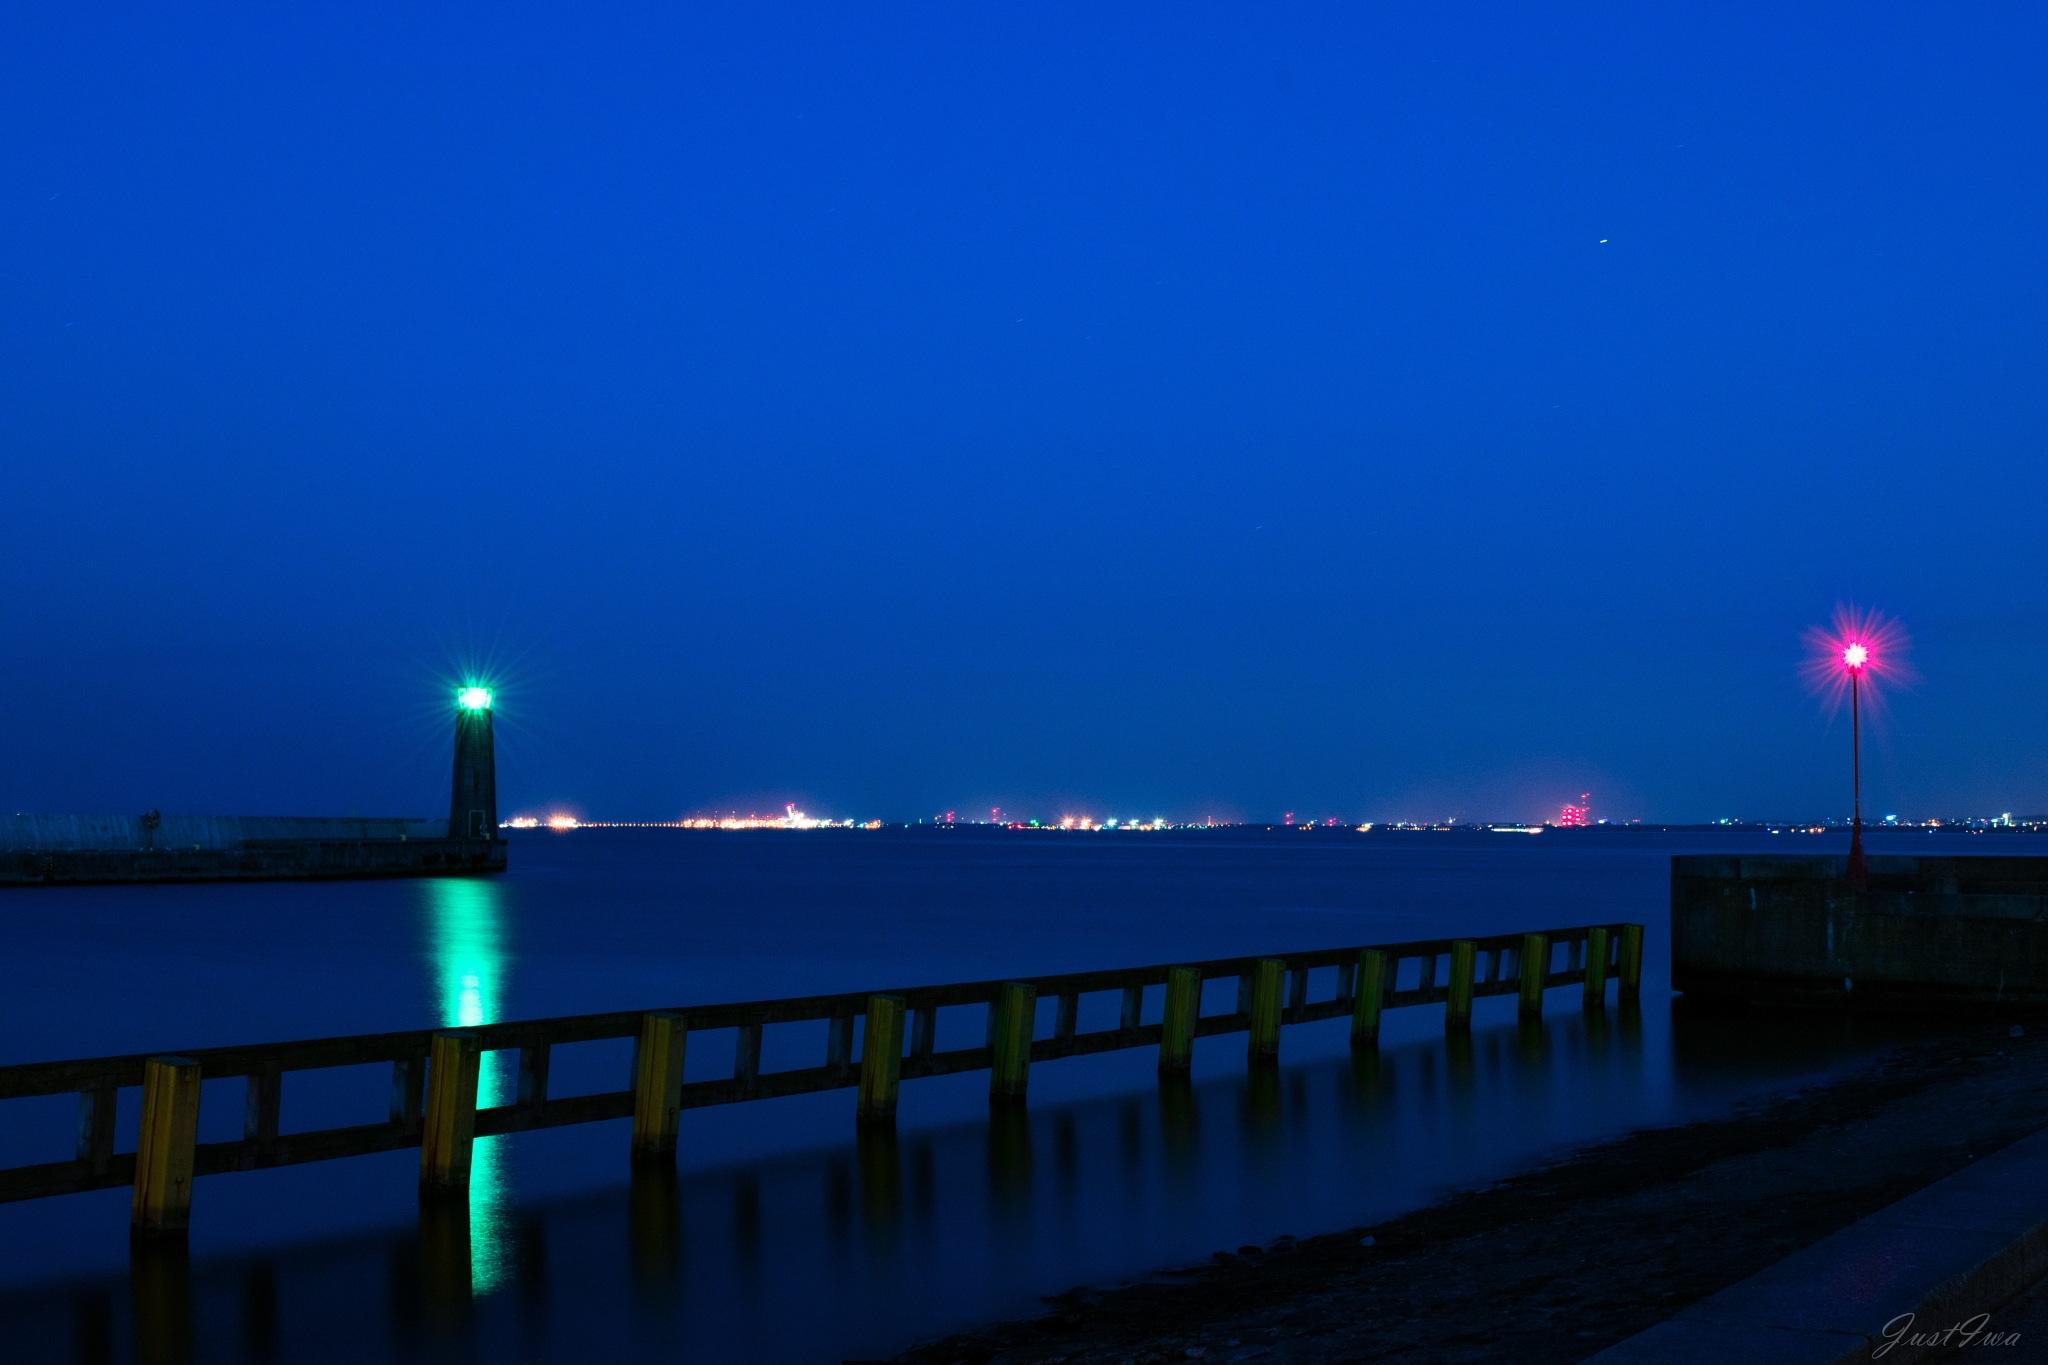 green light on baltic sea by JustIwa